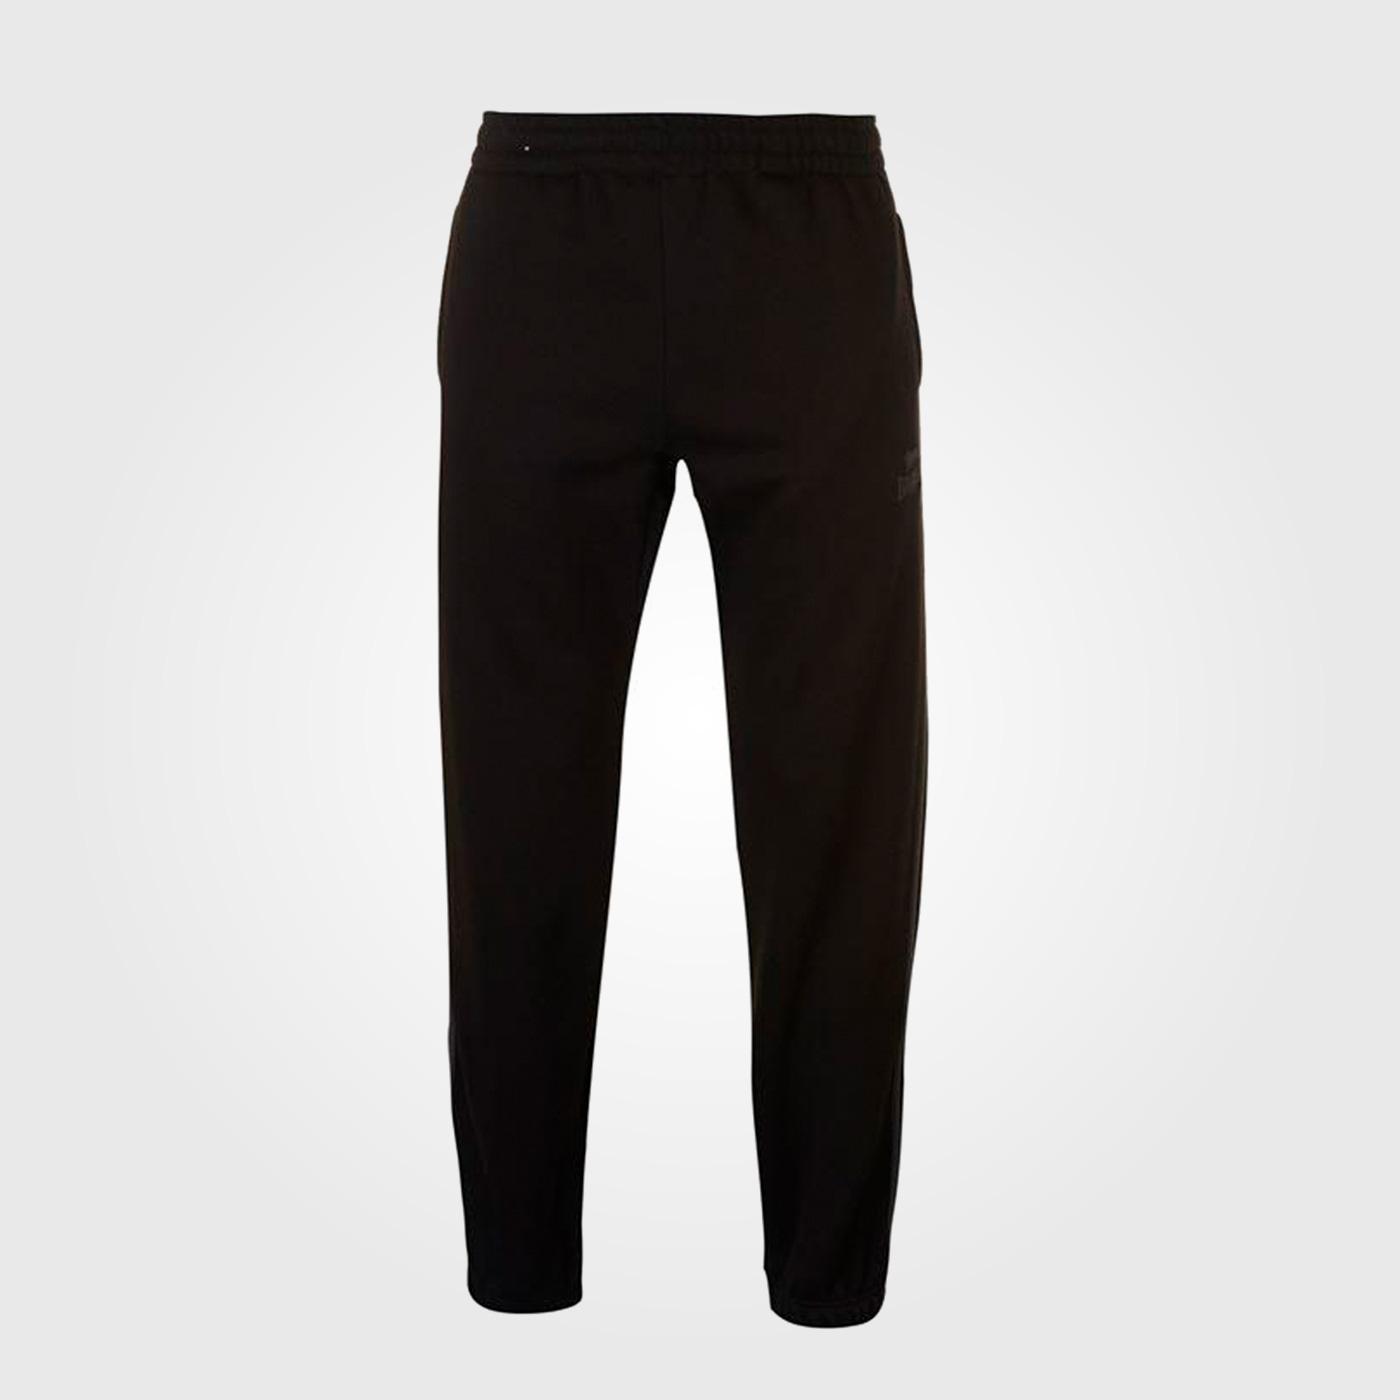 Спортивные штаны Lonsdale 2 Stripe Jogging Mens Black/Charcoal